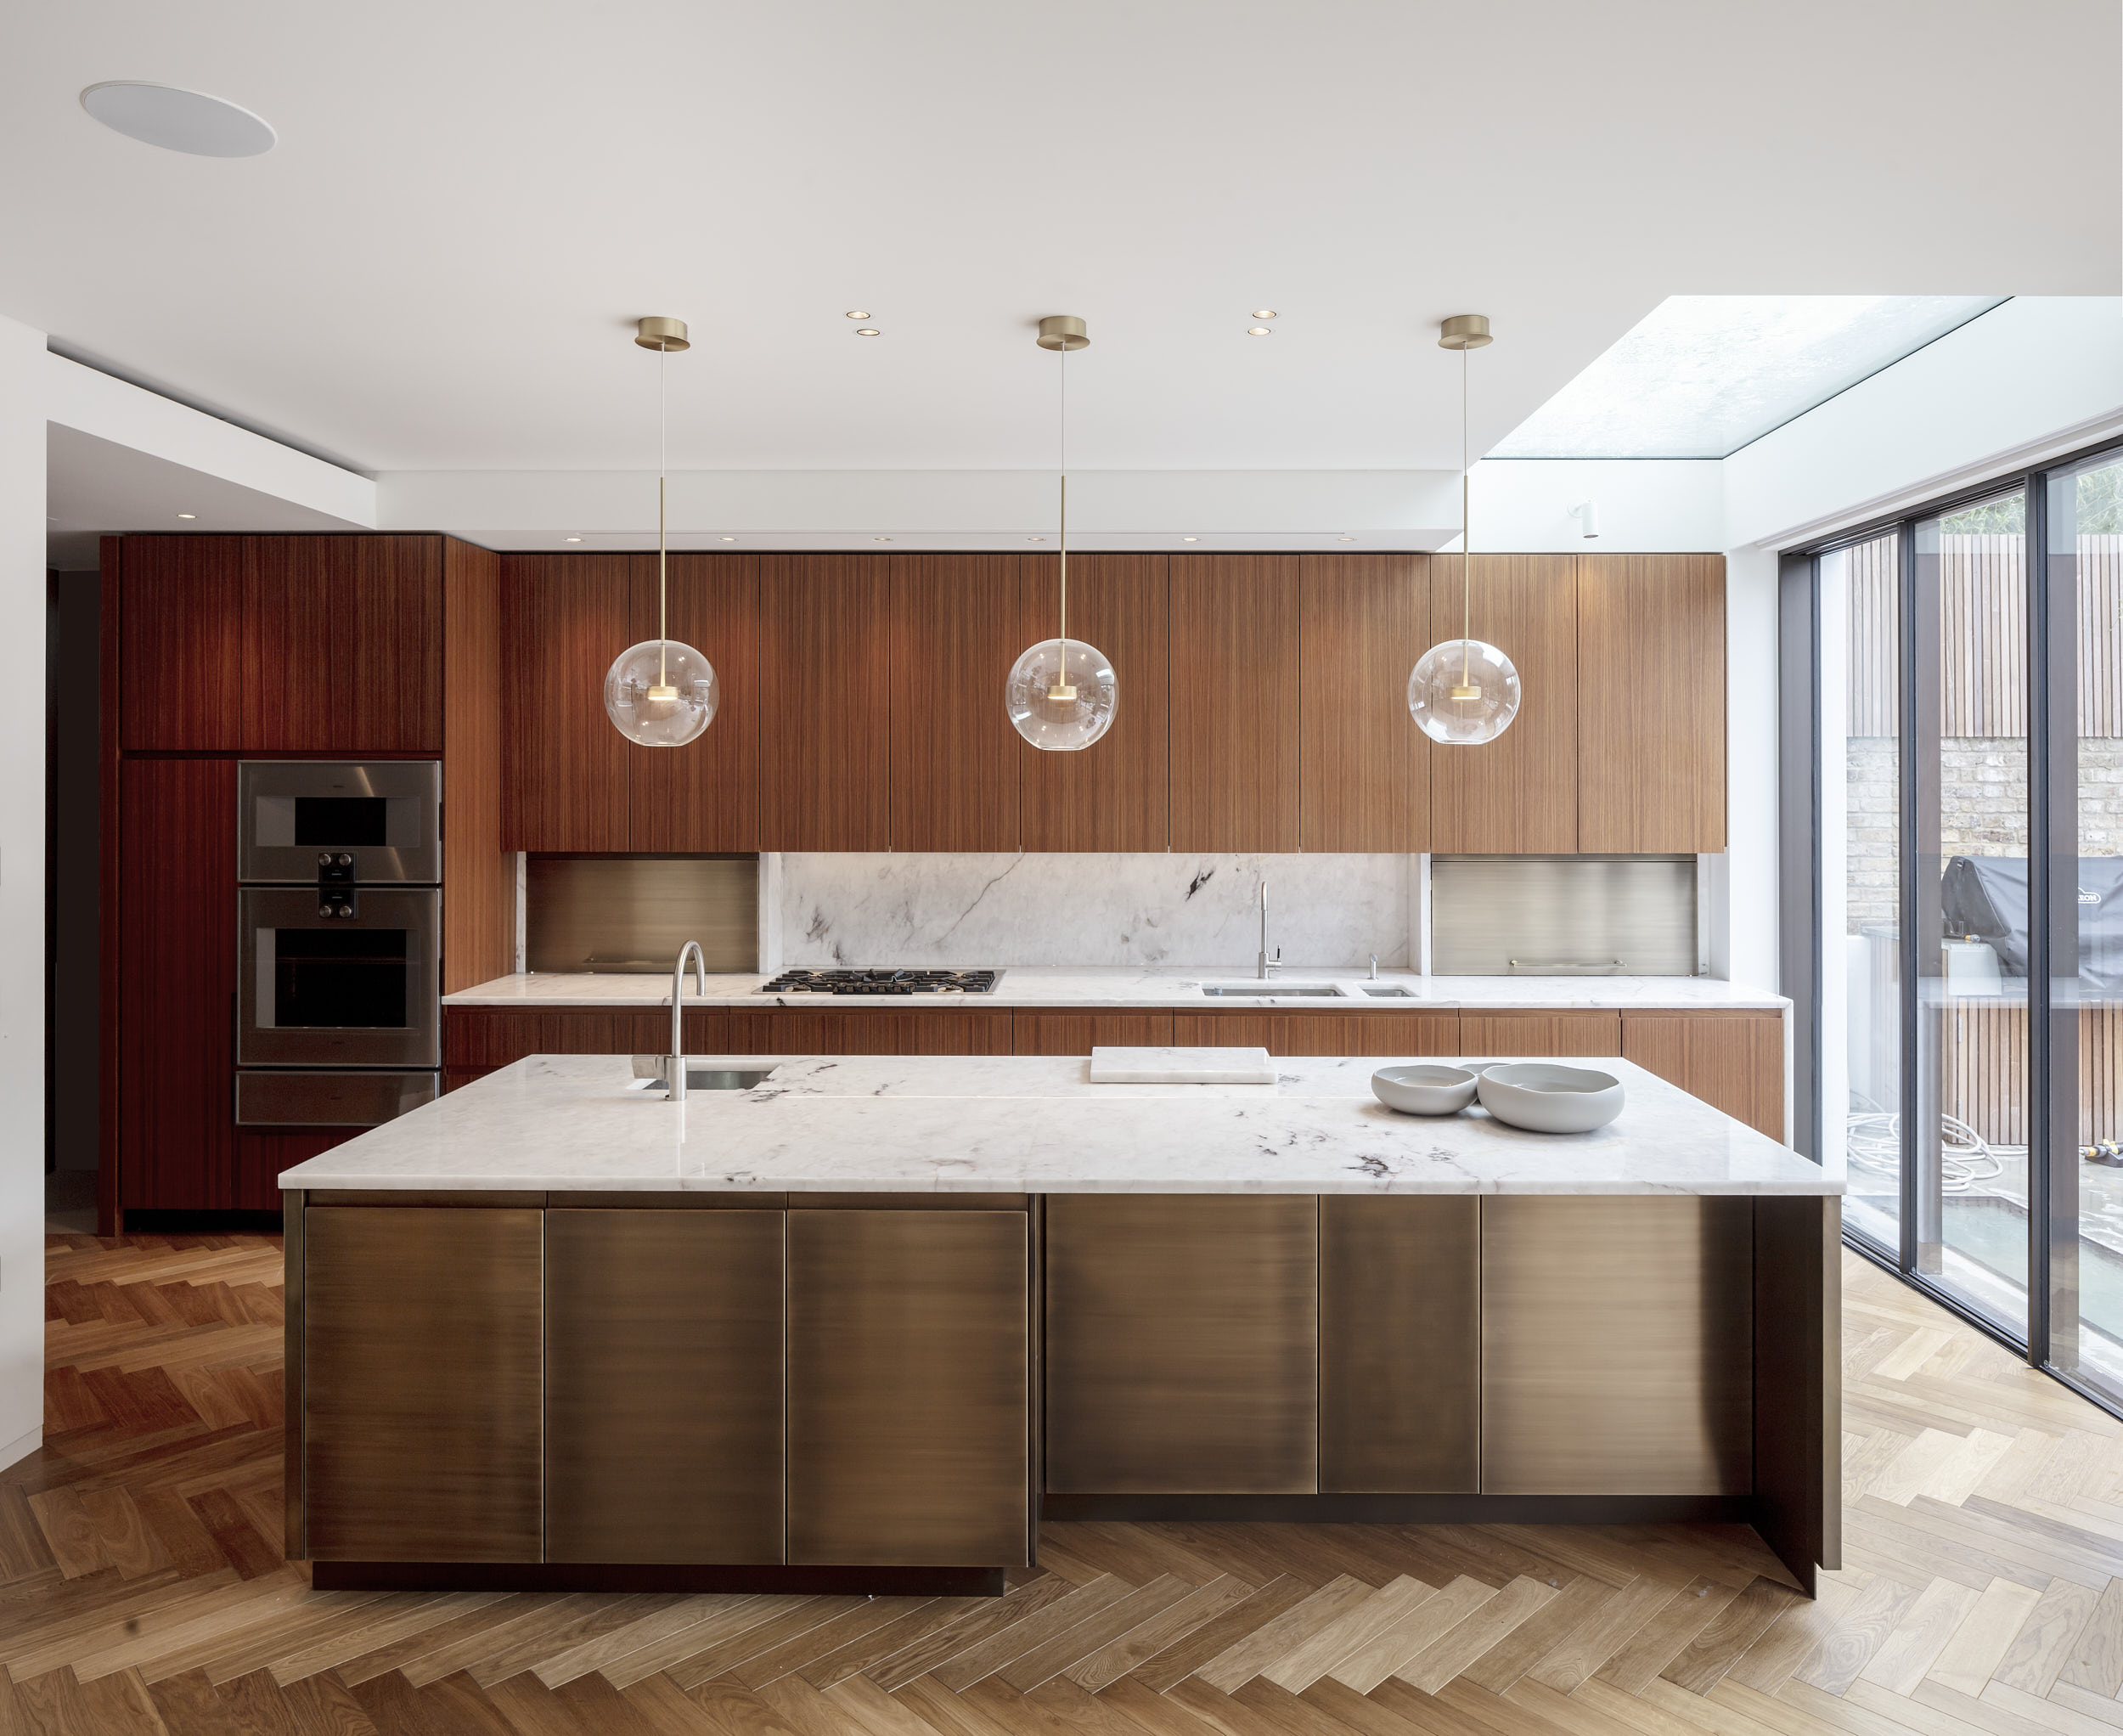 Kitchen interior photography.